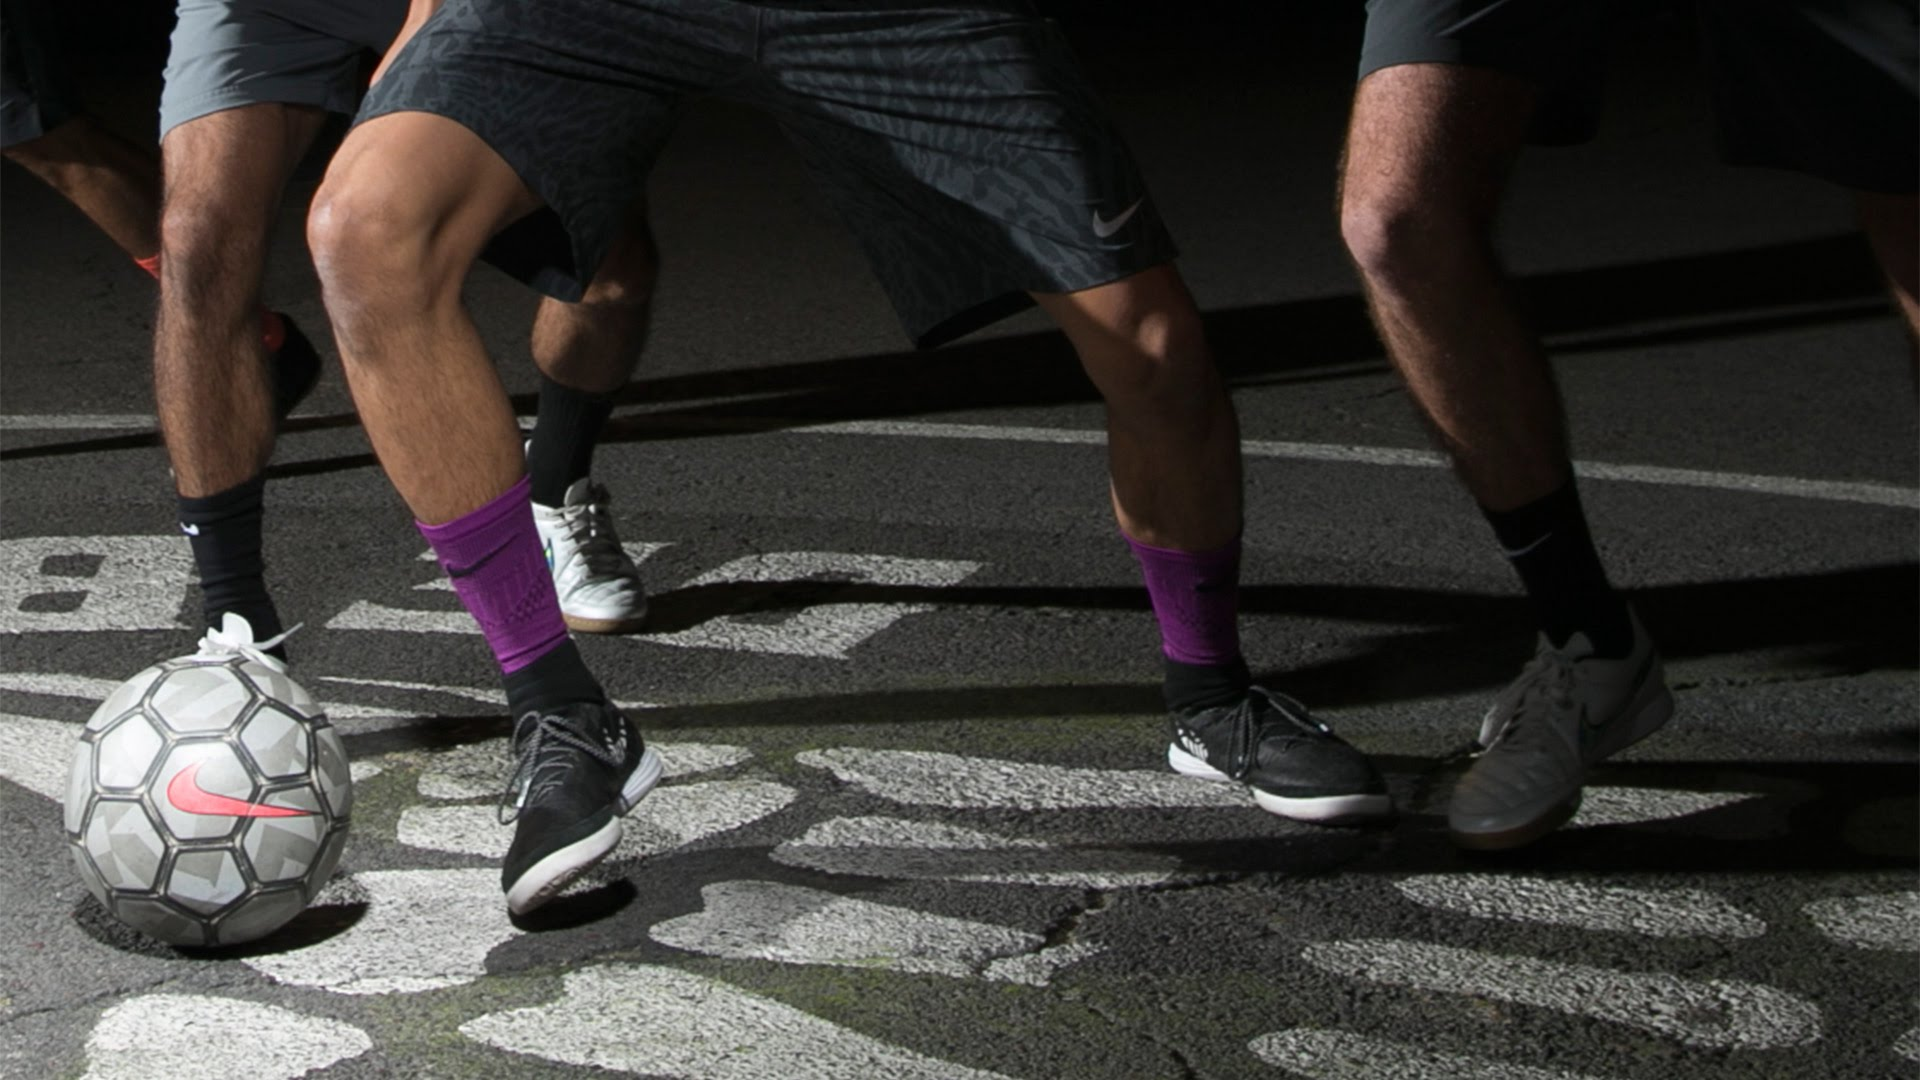 Hd Nike Calcetto Scarpe Mercurial 2013 80OnwPk